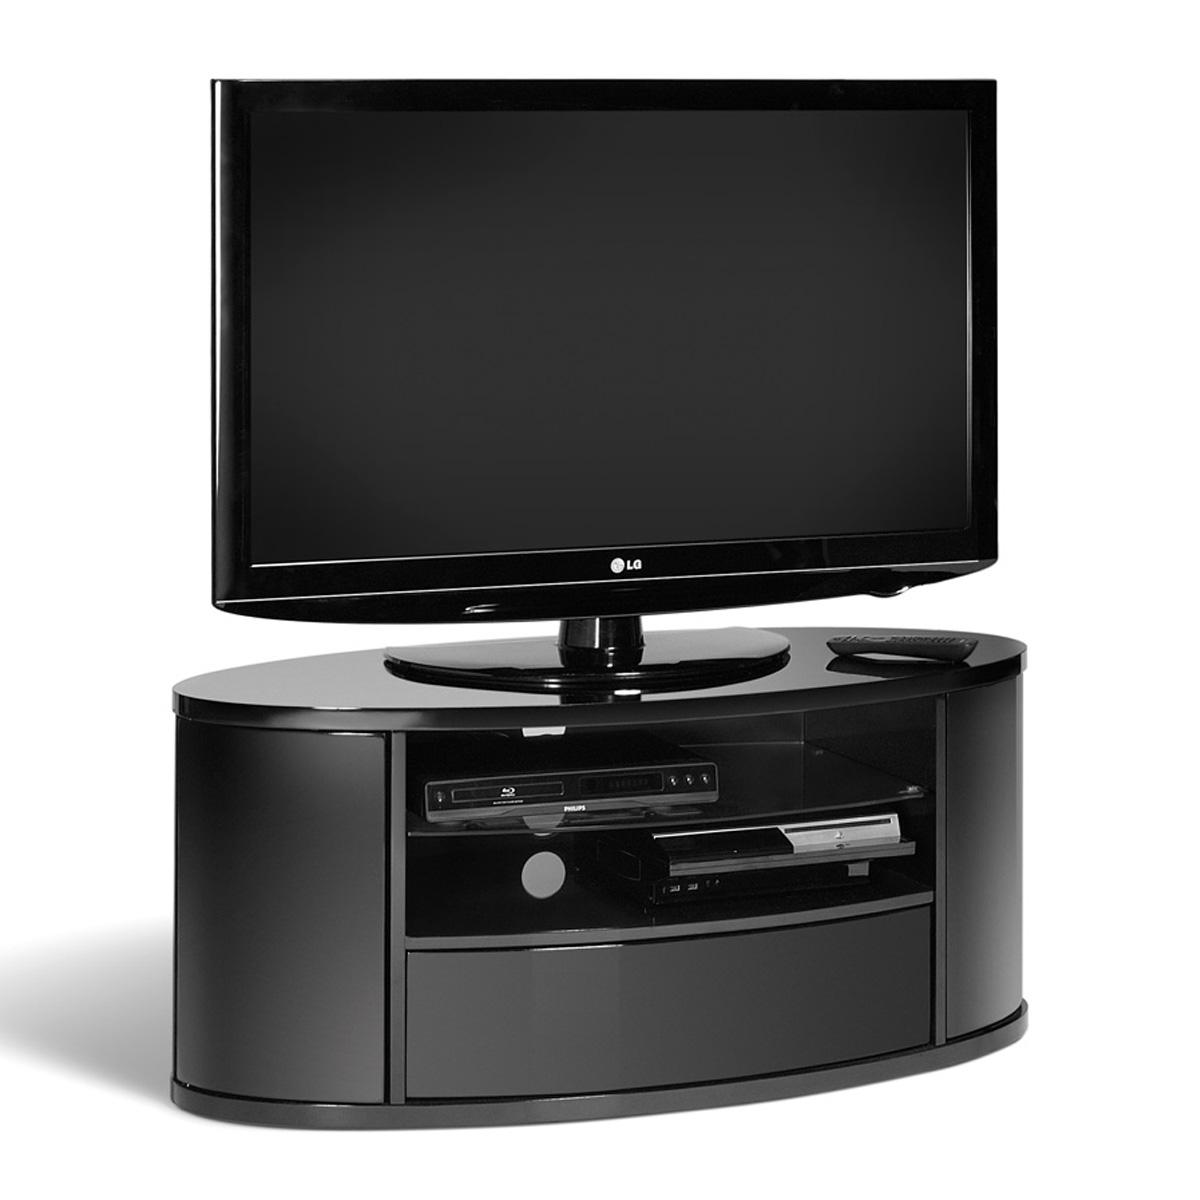 curved design black lcd plasma tv stand 40 50 inch screen. Black Bedroom Furniture Sets. Home Design Ideas